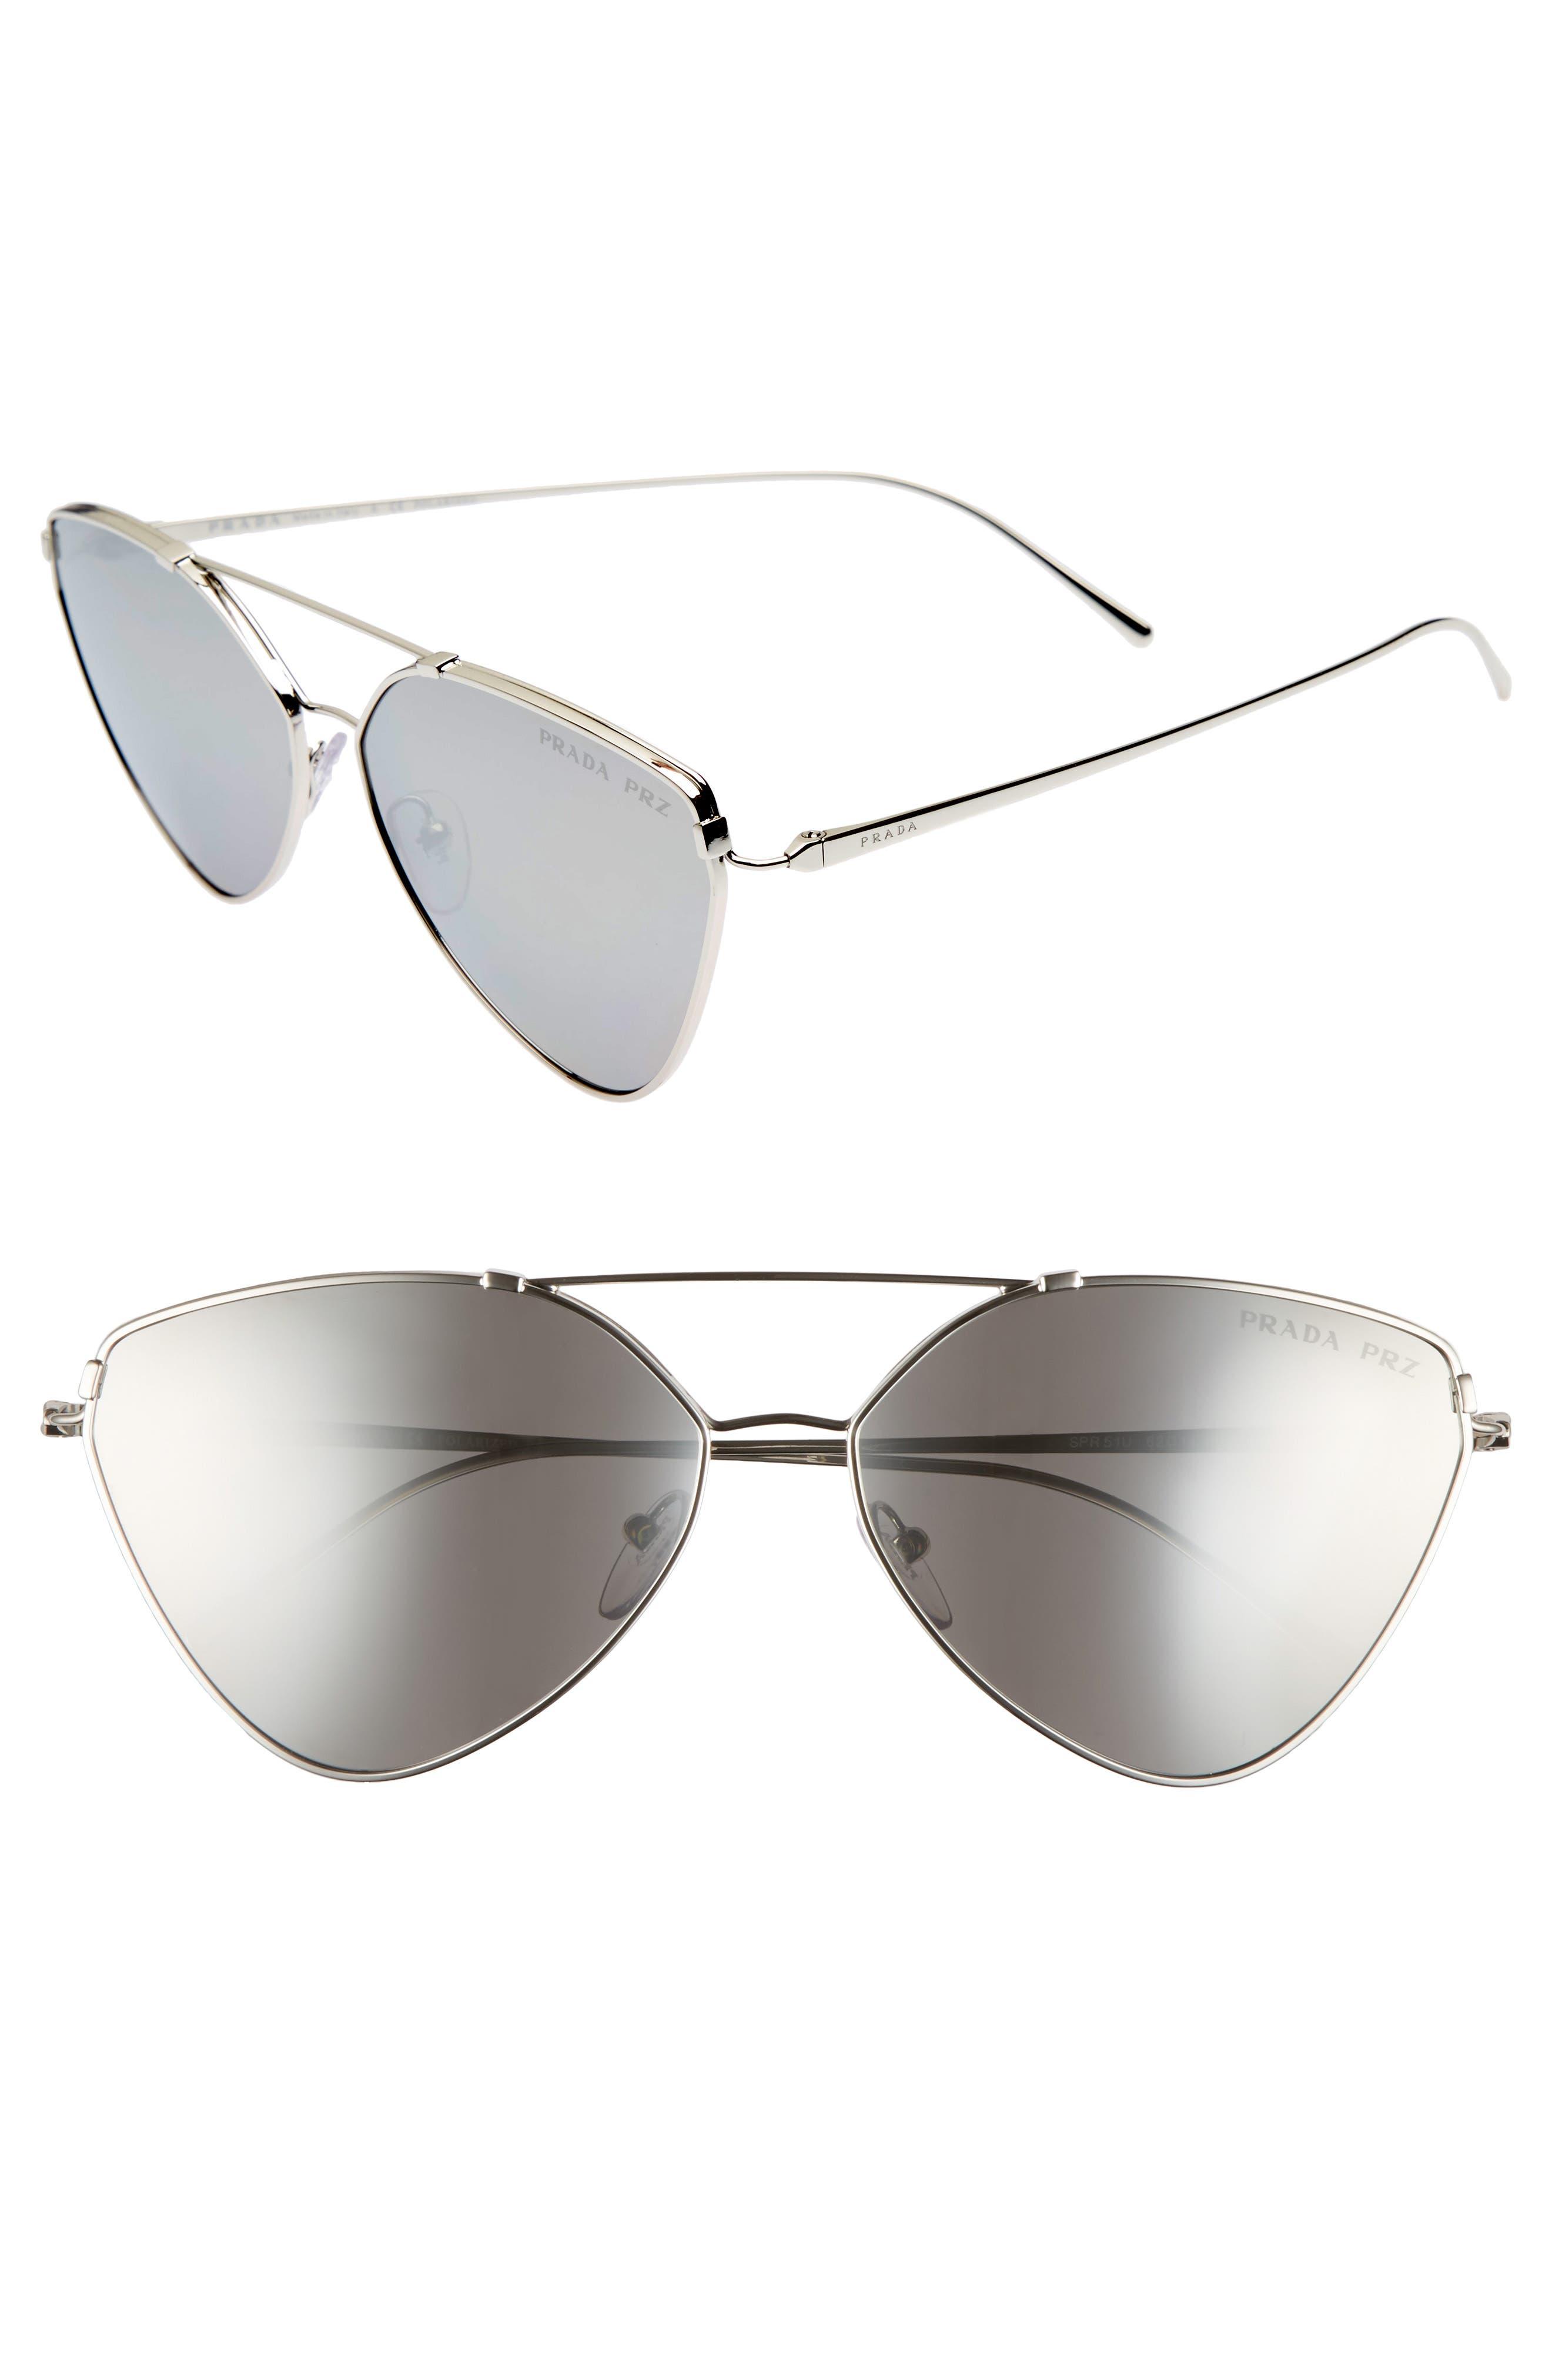 62mm Polarized Oversize Aviator Sunglasses,                         Main,                         color, Silver